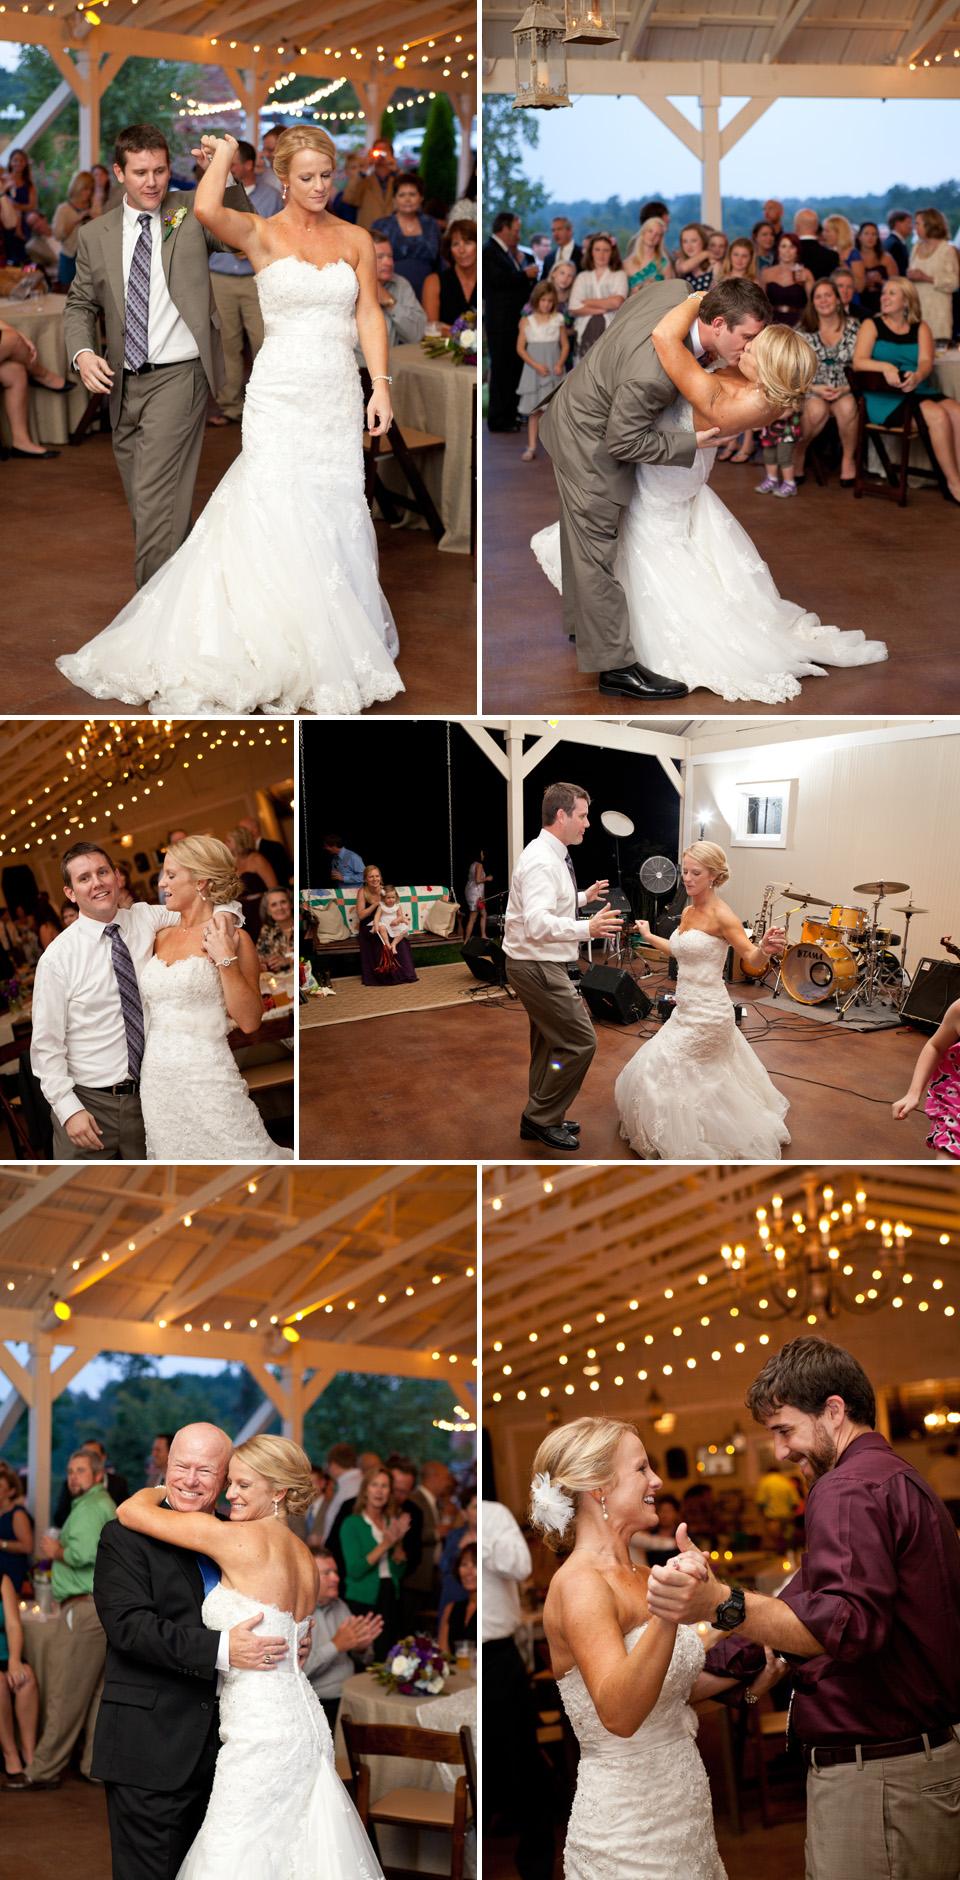 nashville wedding photography first dance